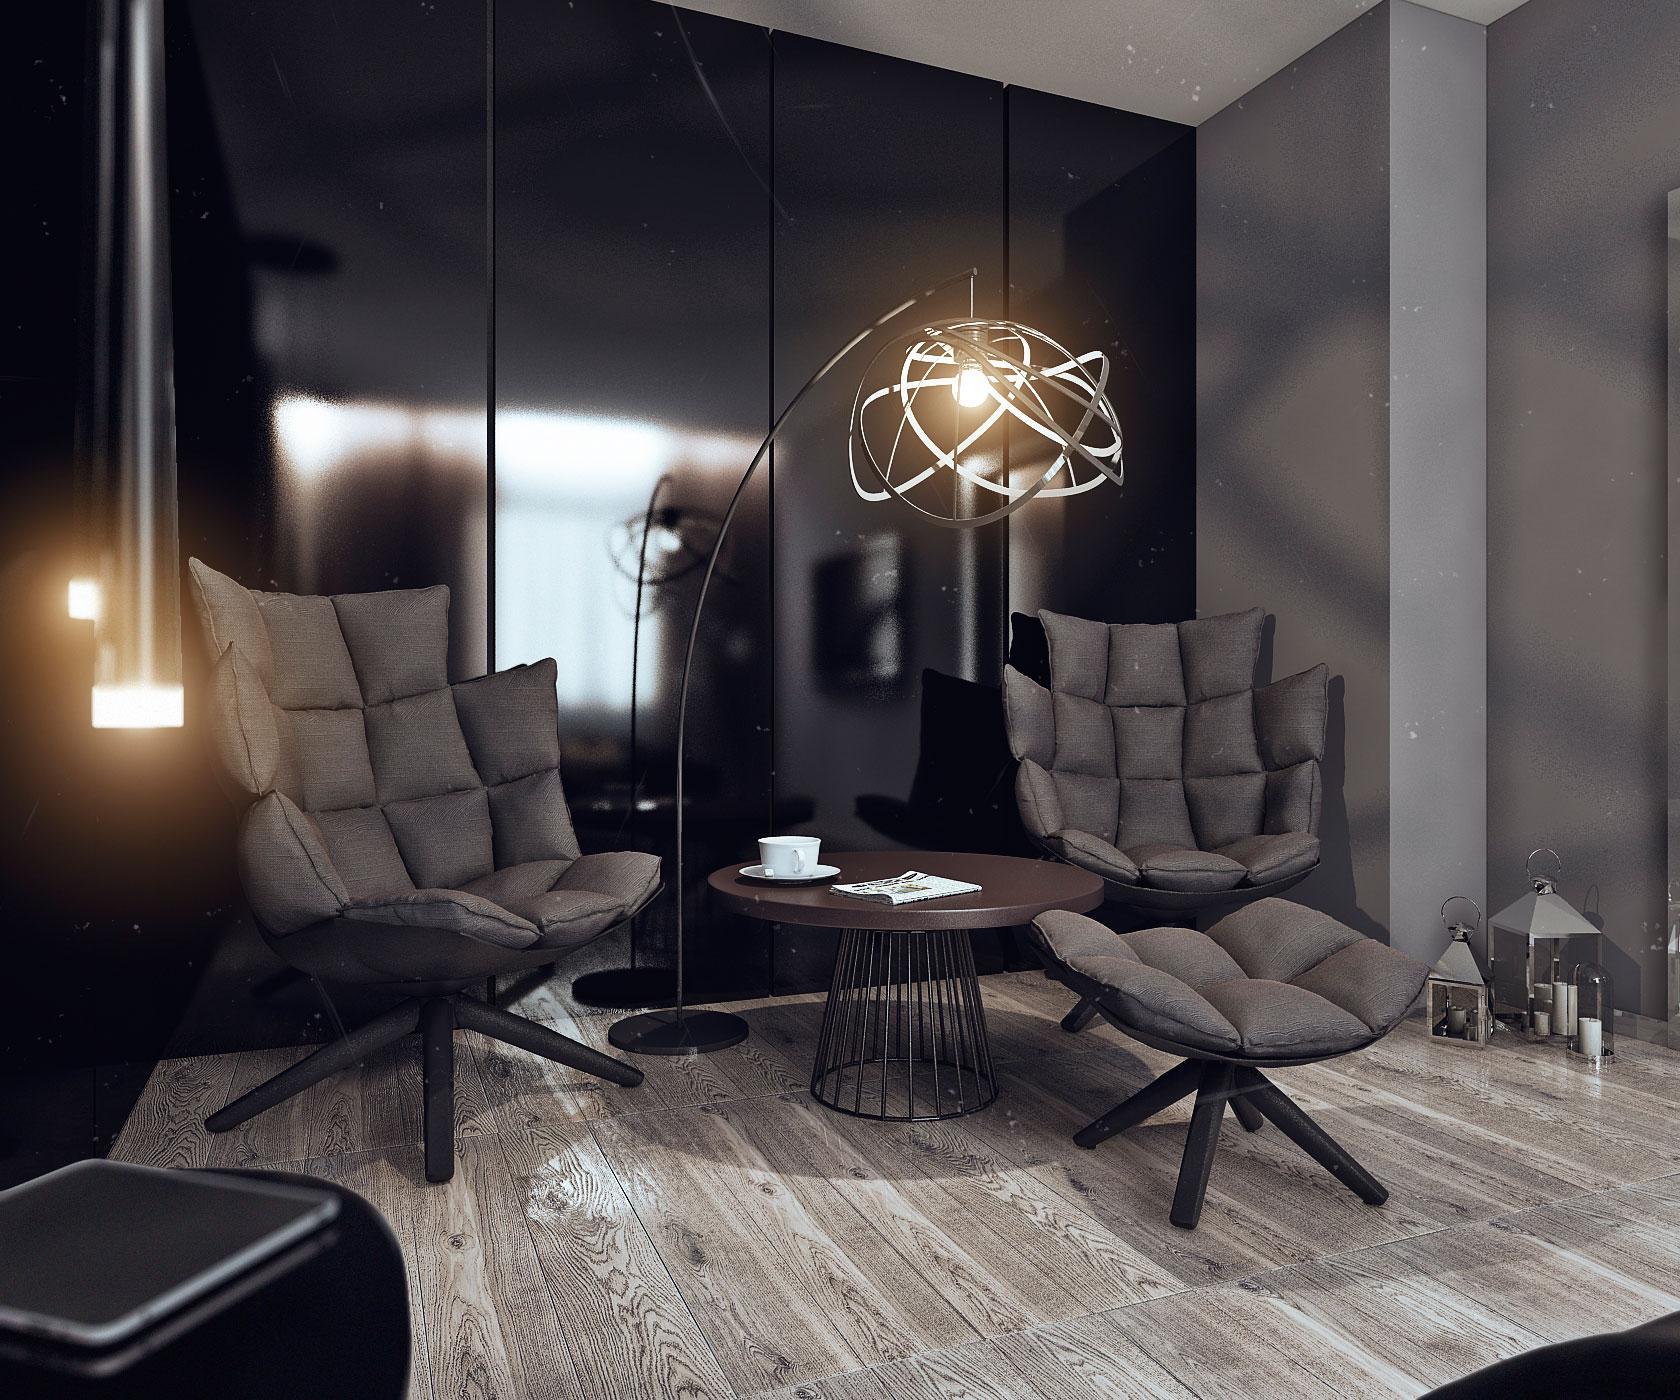 2018 Interior Decorator Cost Calculator: Тенденции дизайна интерьера 2018 года > 250 фото